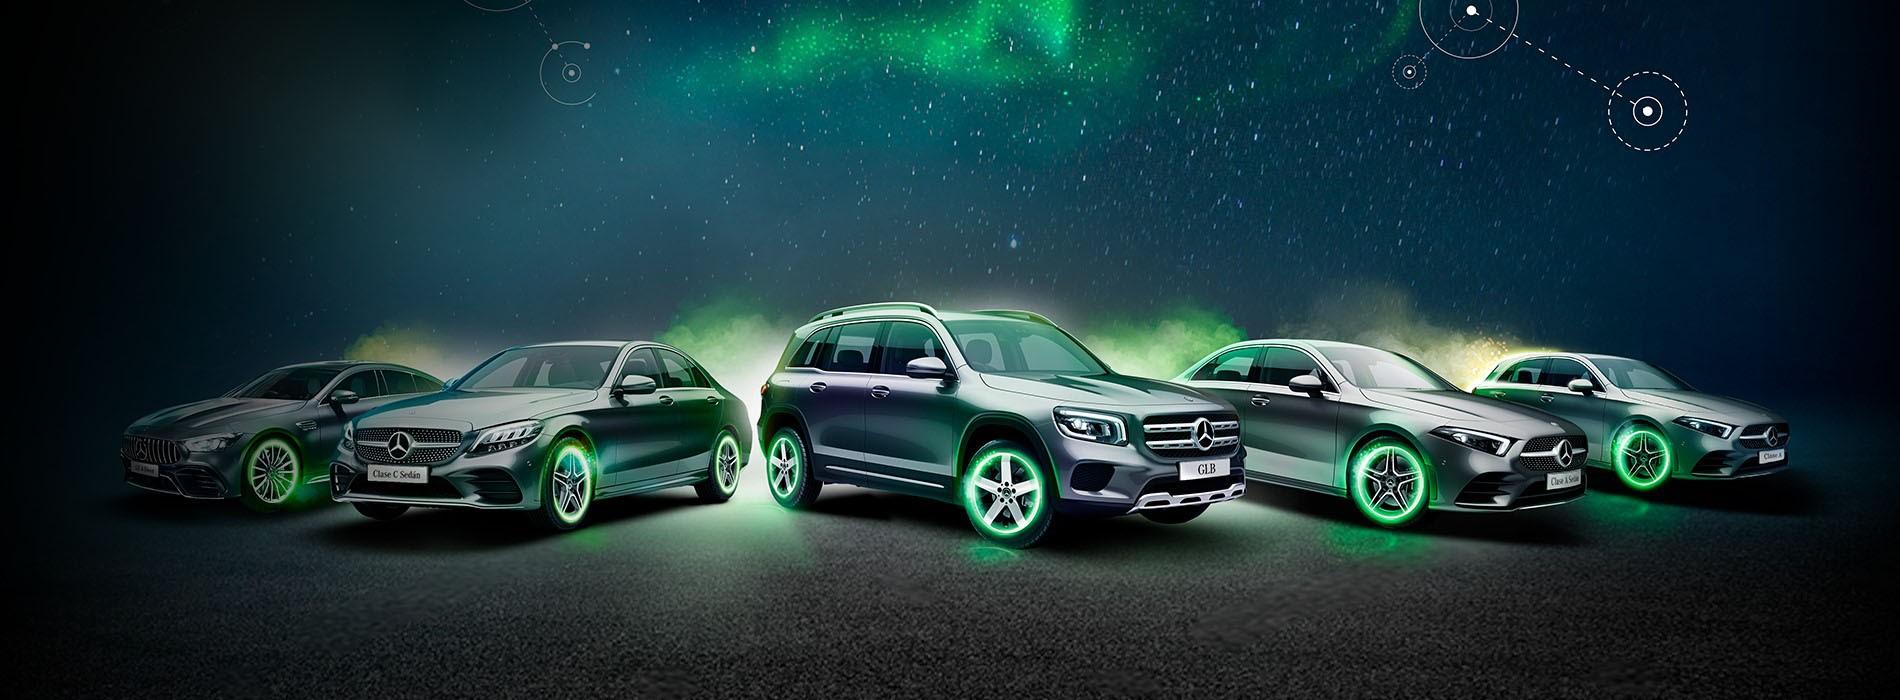 Mercedes-Benz Lluvias de estrellas